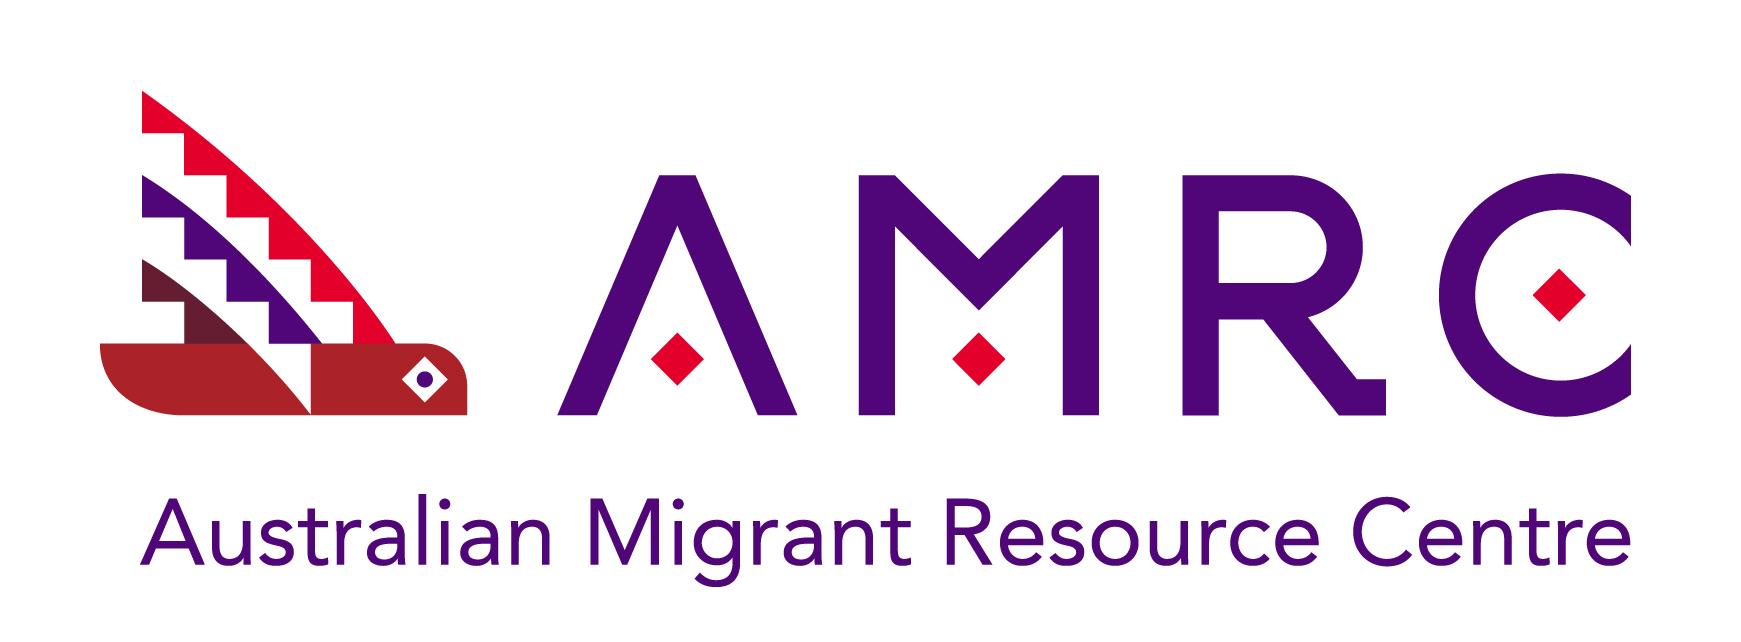 Australian Migrant Resource Centre Logo